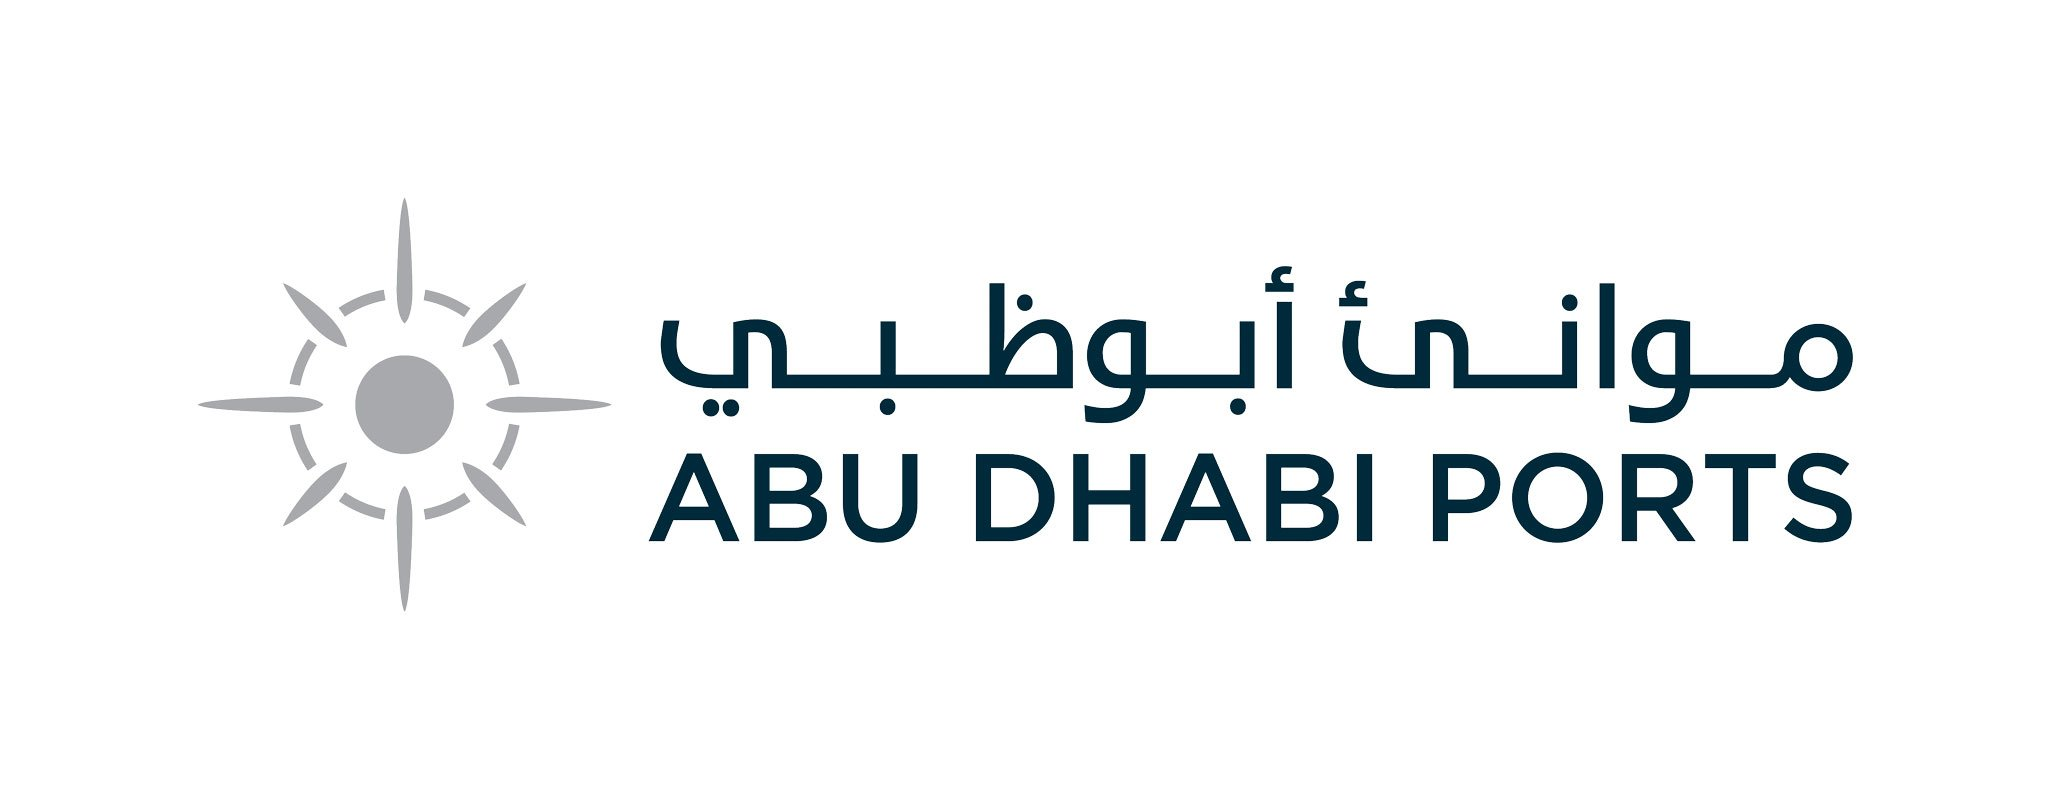 Abu Dhabi Ports Company (ADPC) logo